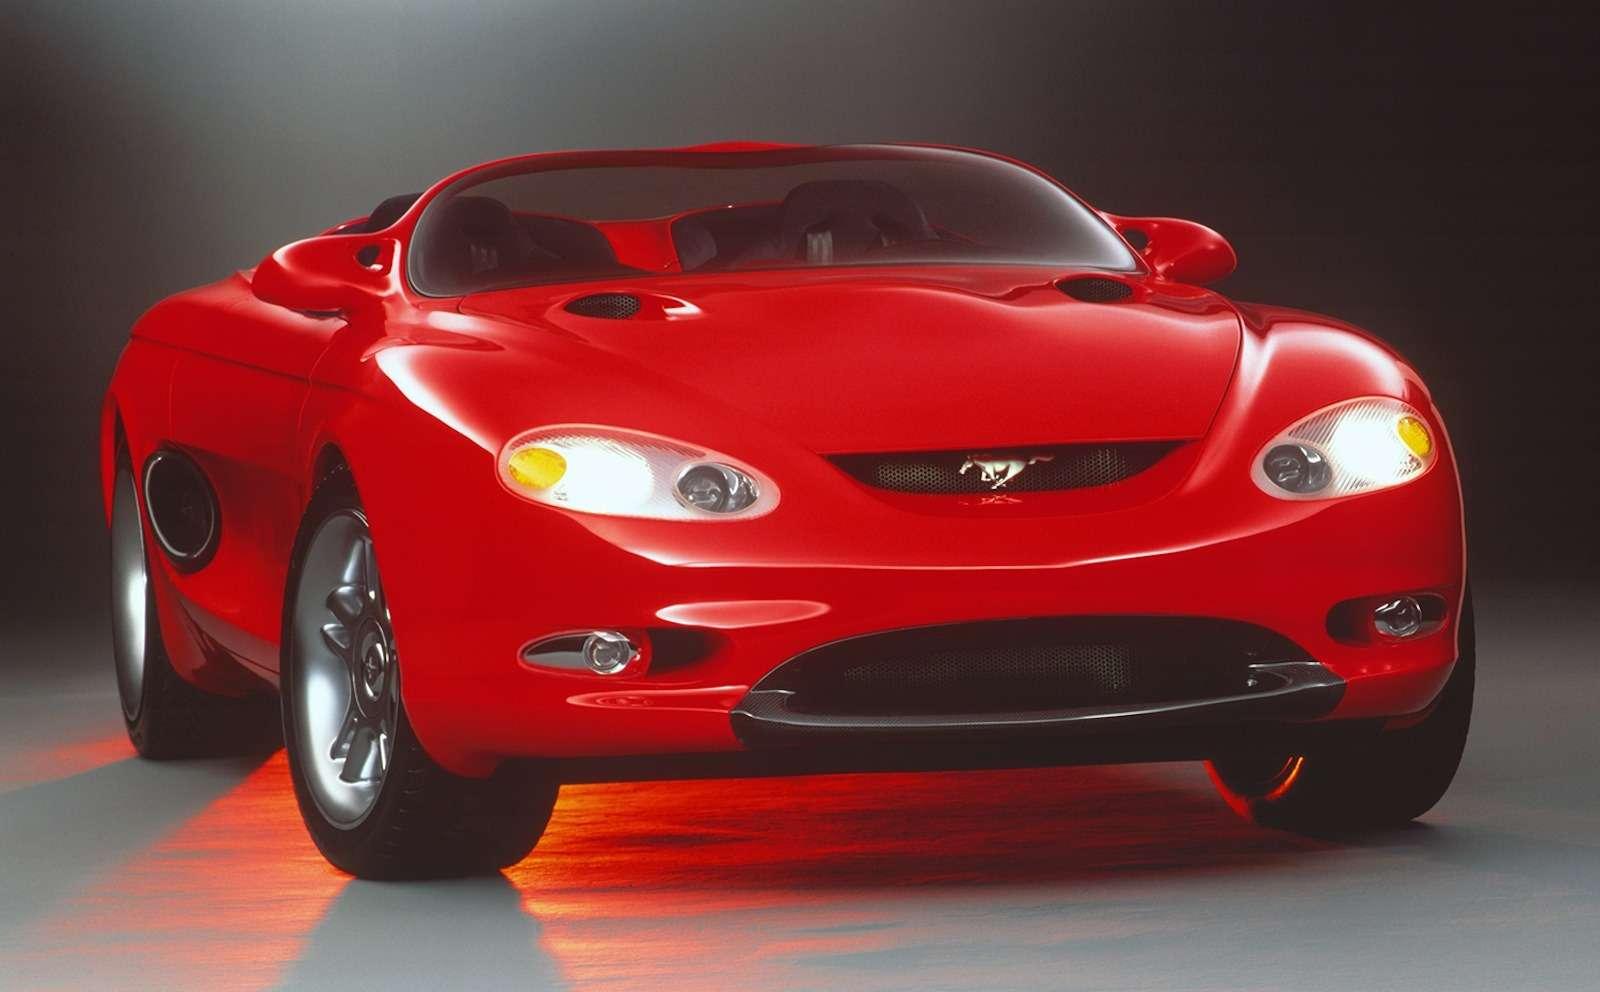 1992 Mach III concept